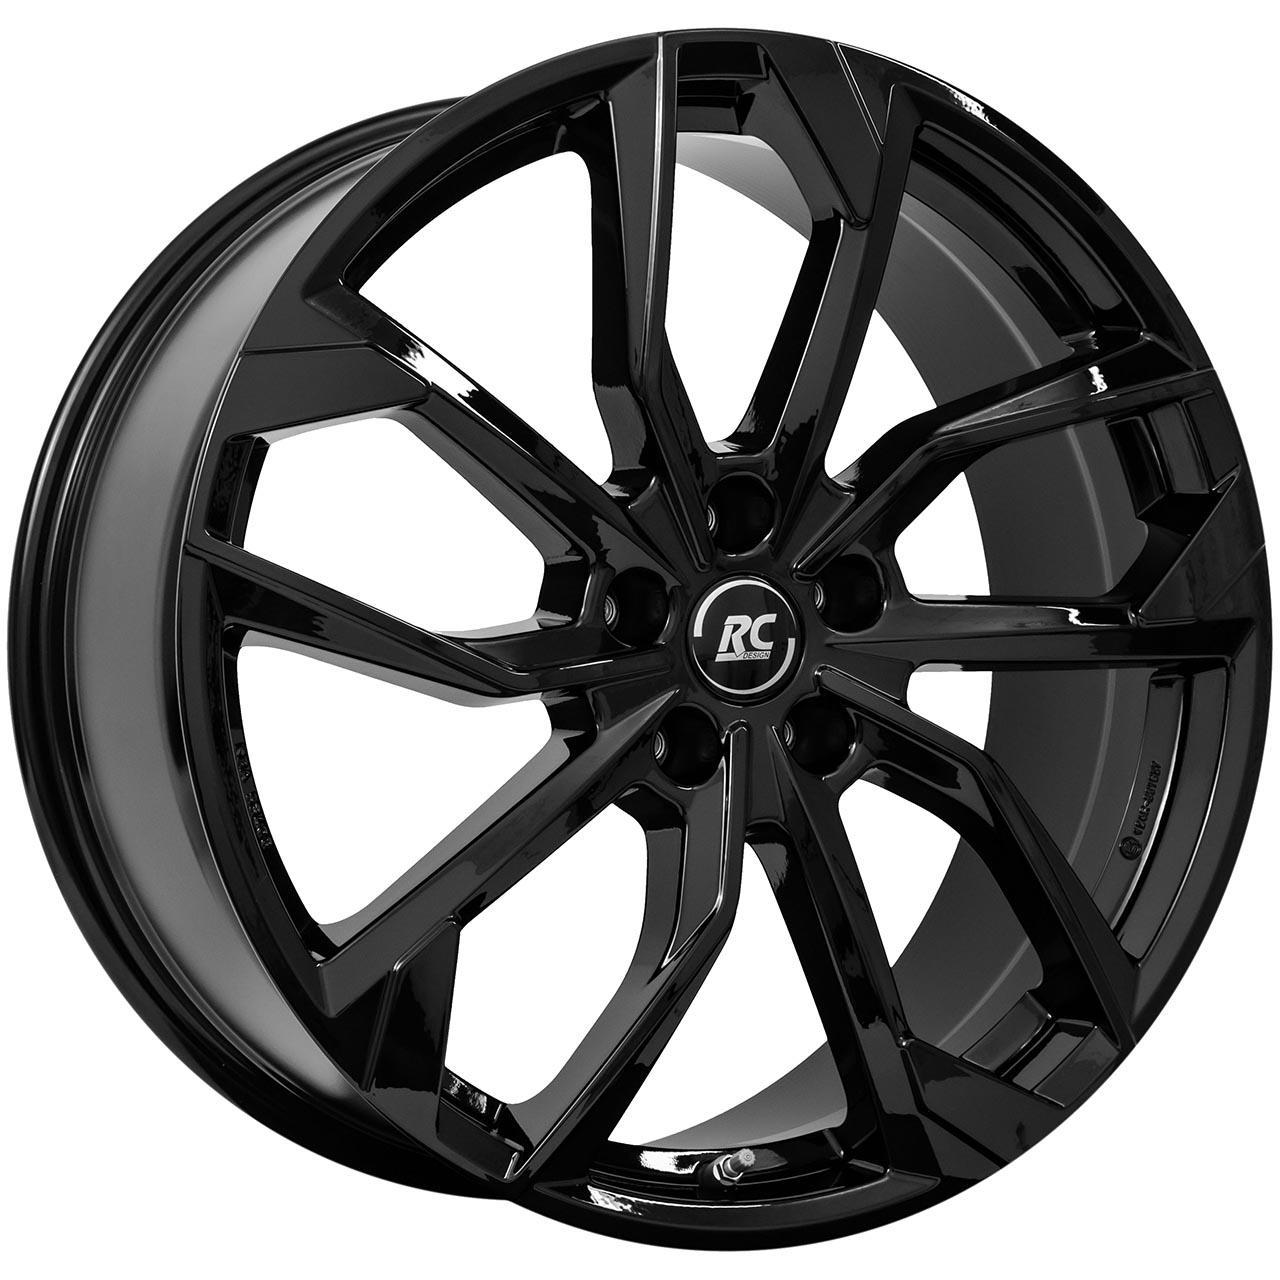 RC Design Rc34 Black glossy 8x18 5x108 ET44